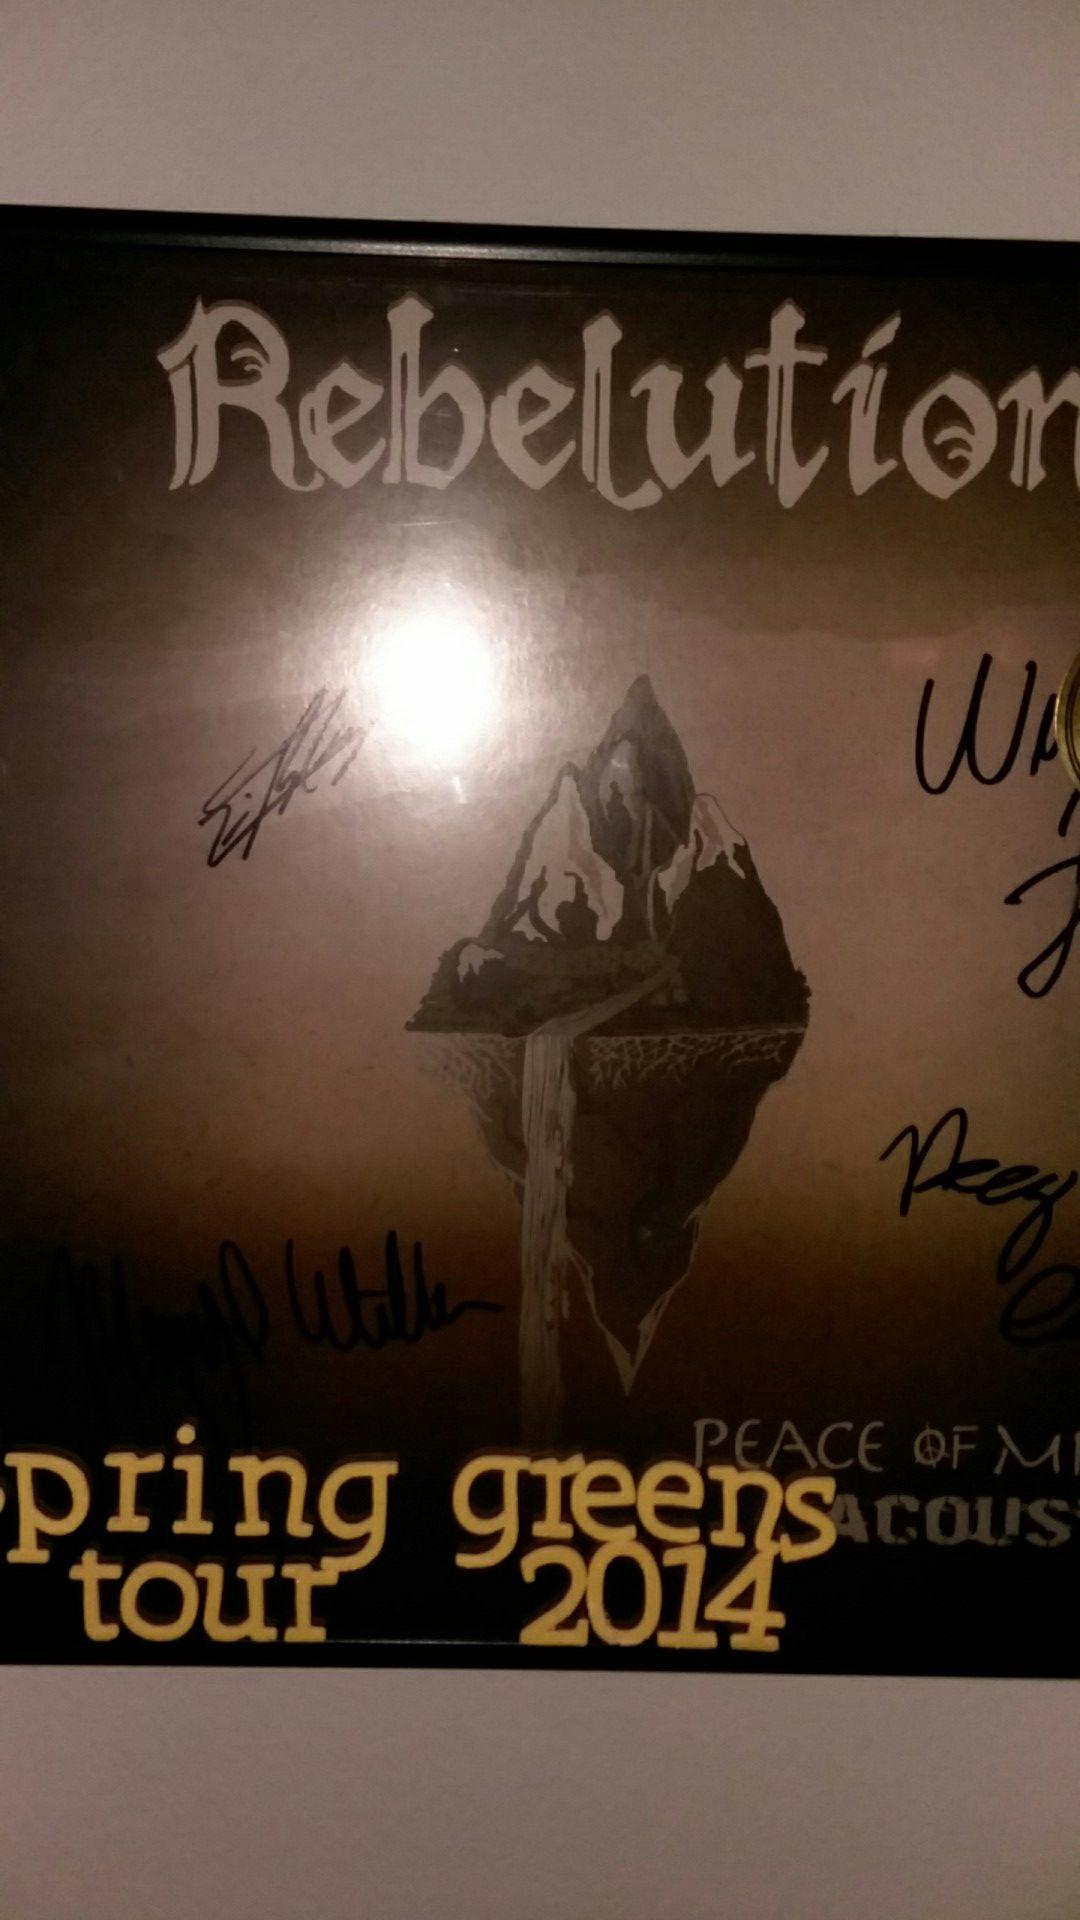 Rebelution peace of mind autographed vinyl